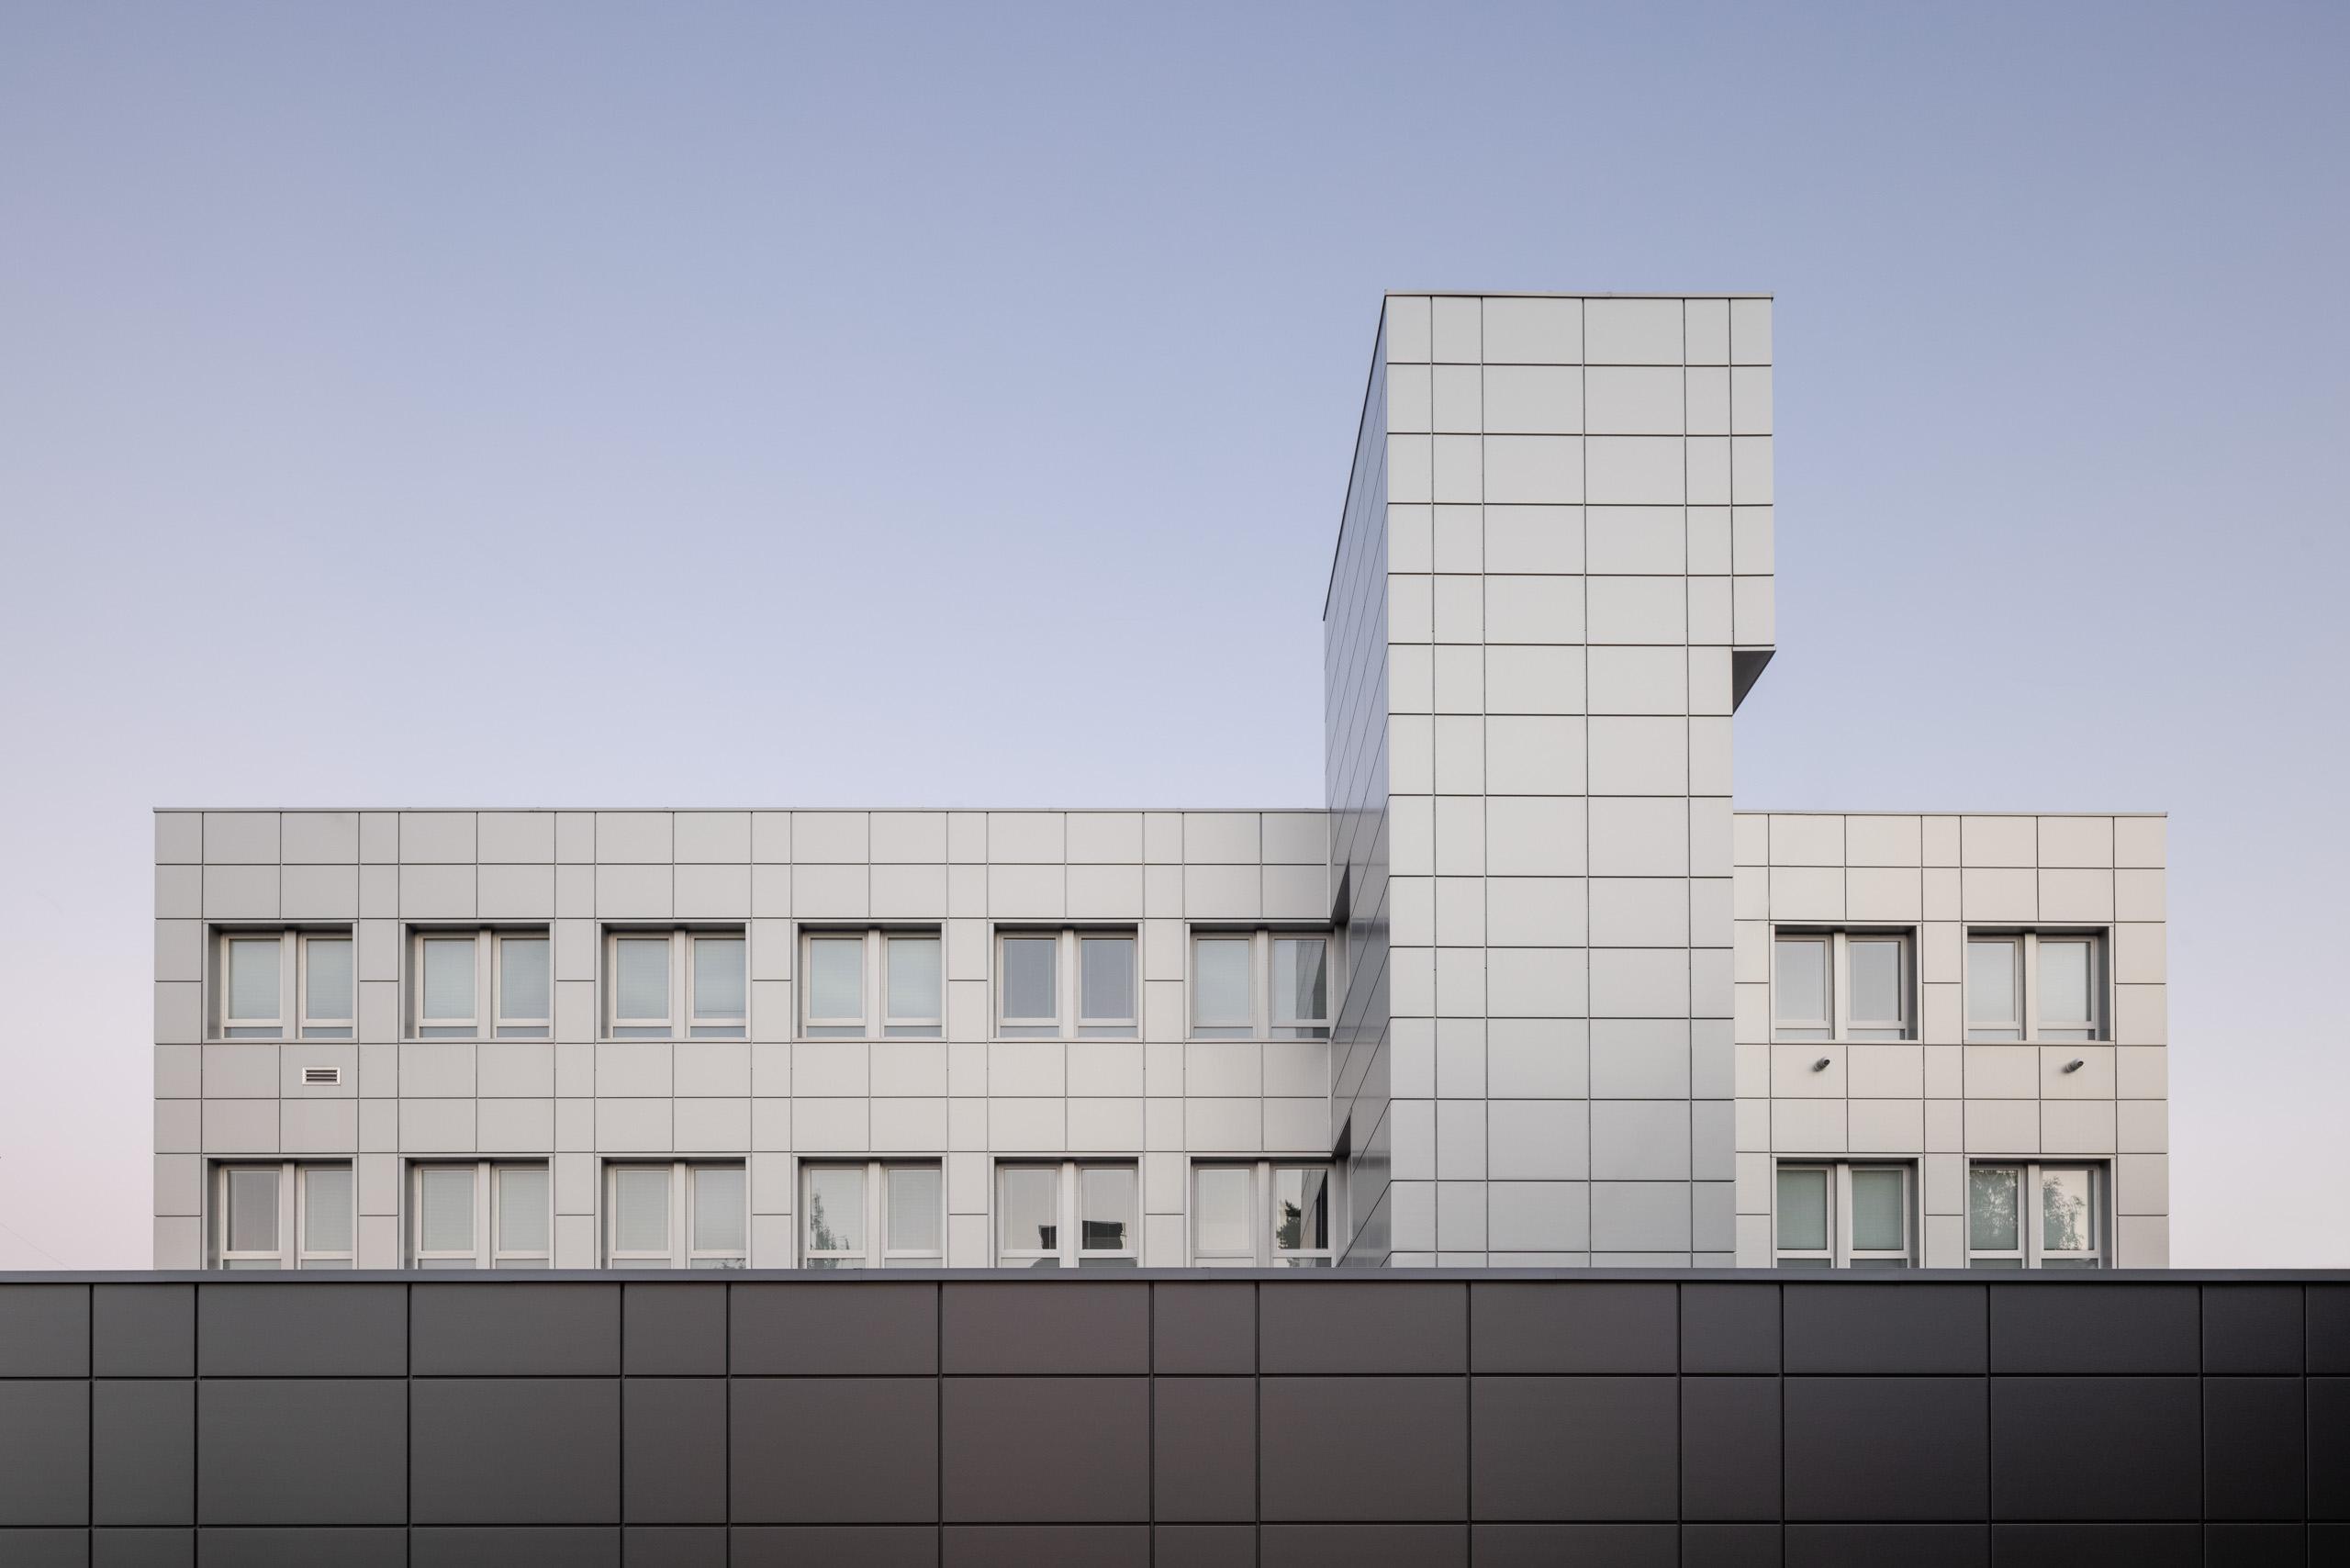 Fa. Wolfram, Industrial Building BW 100